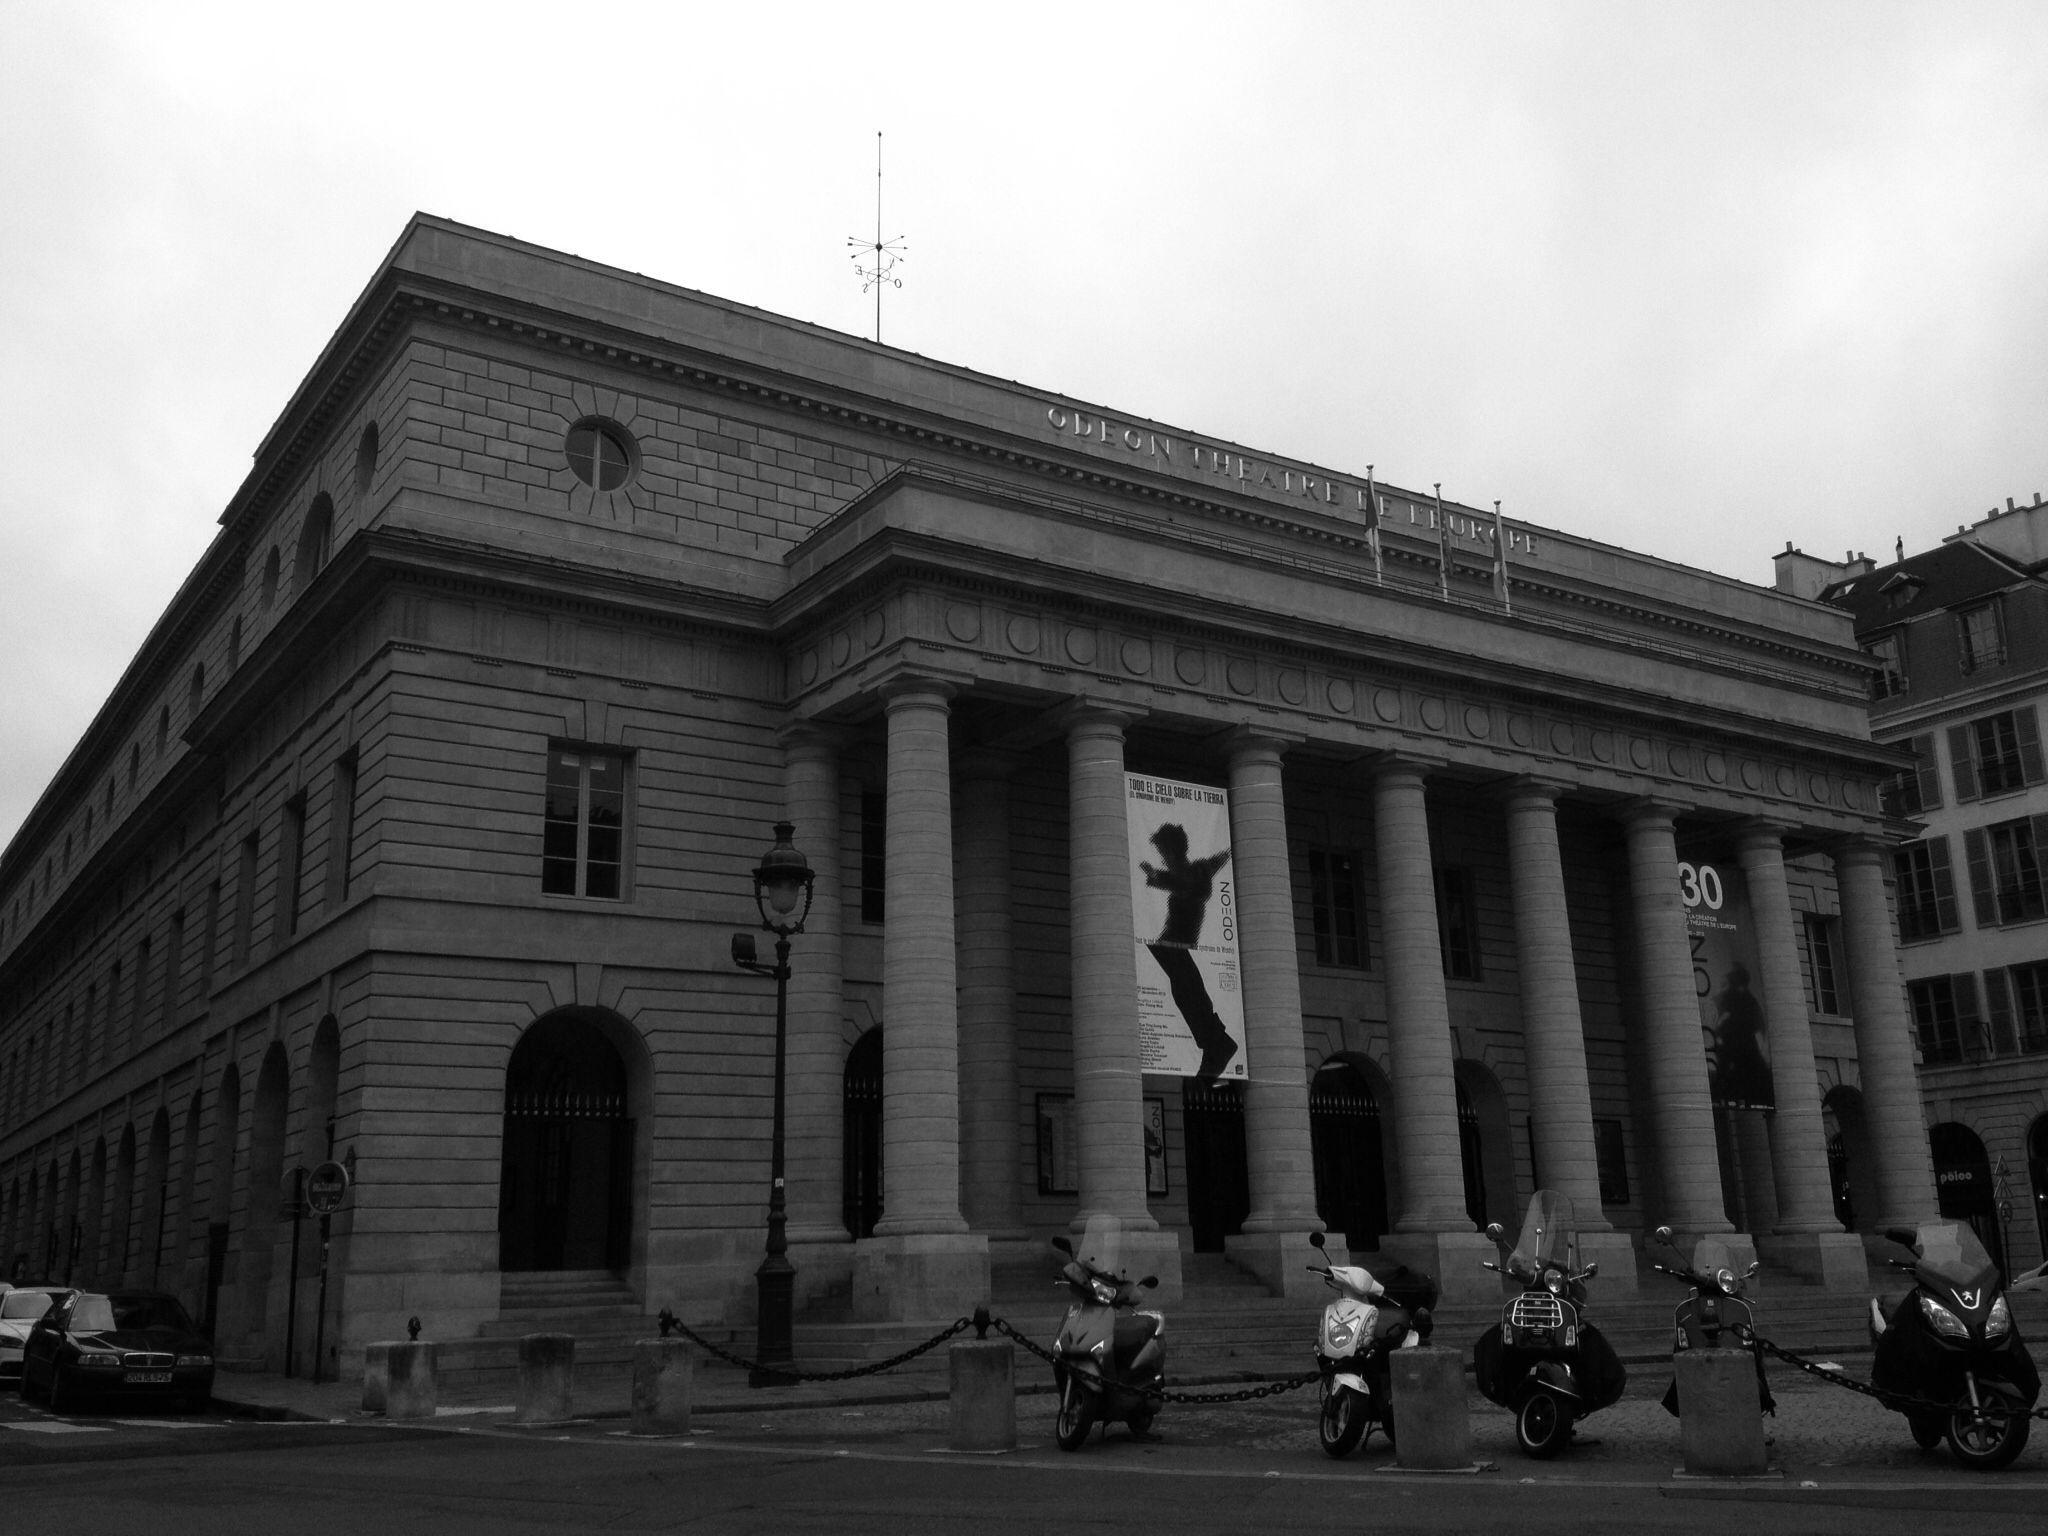 Théâtre de l'Odéon Paris - Foto: Arquiteta Cláudia F. Ferreira